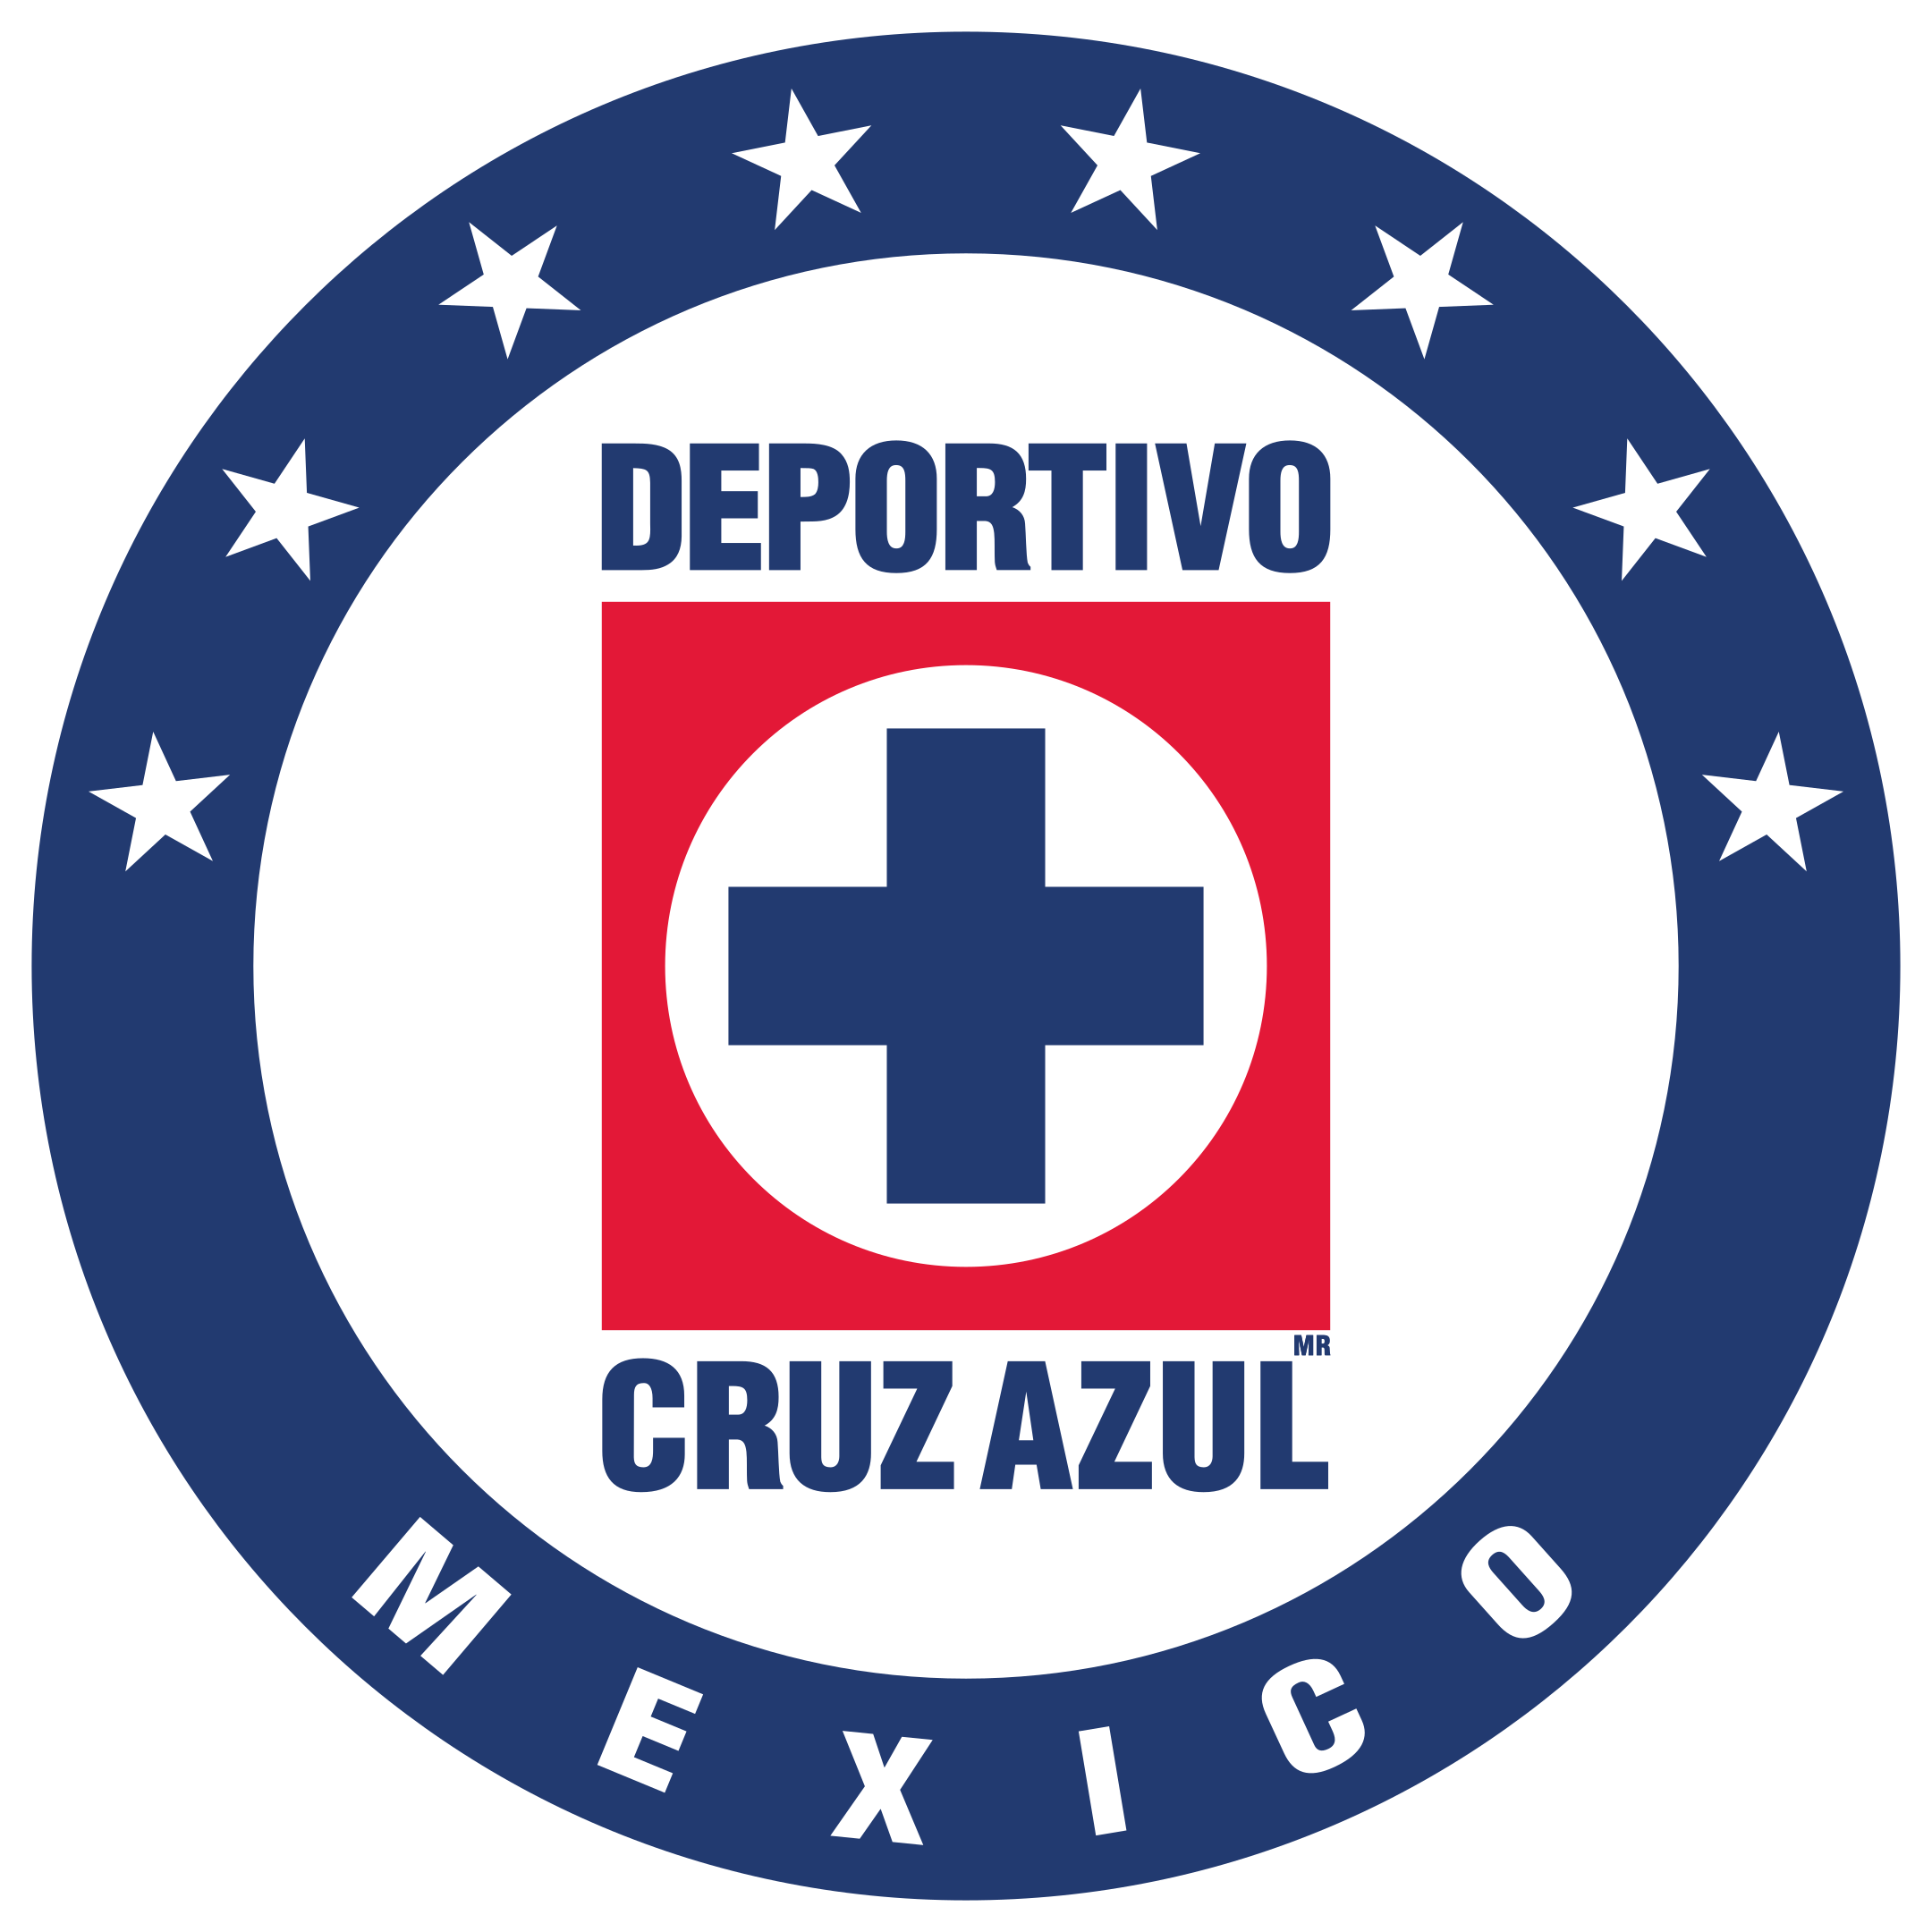 cruz azul fc logo 1 - Cruz Azul FC Logo